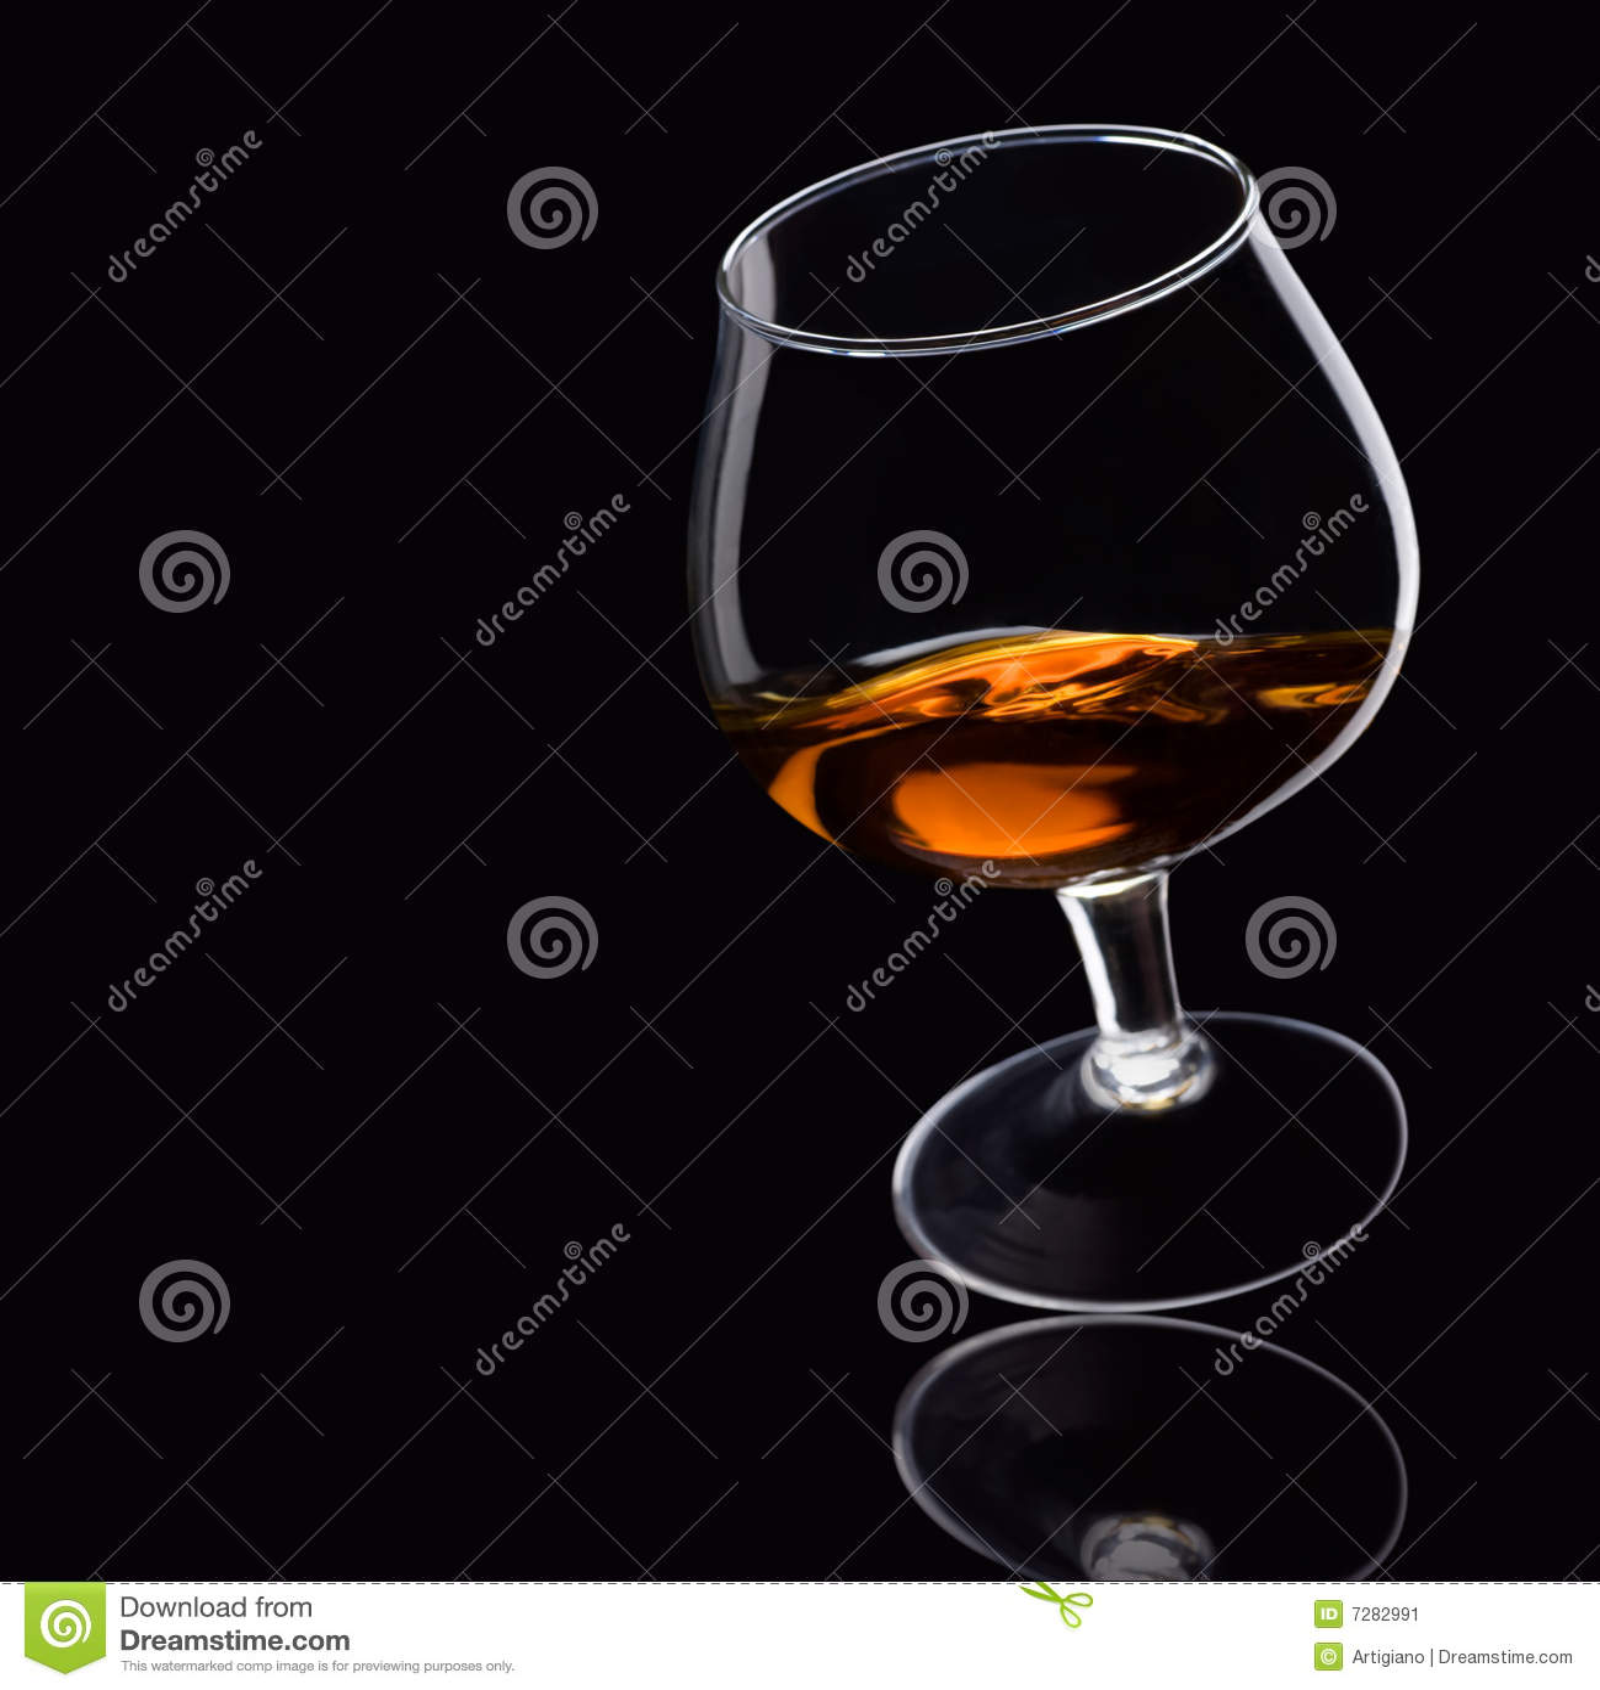 Brandy on black